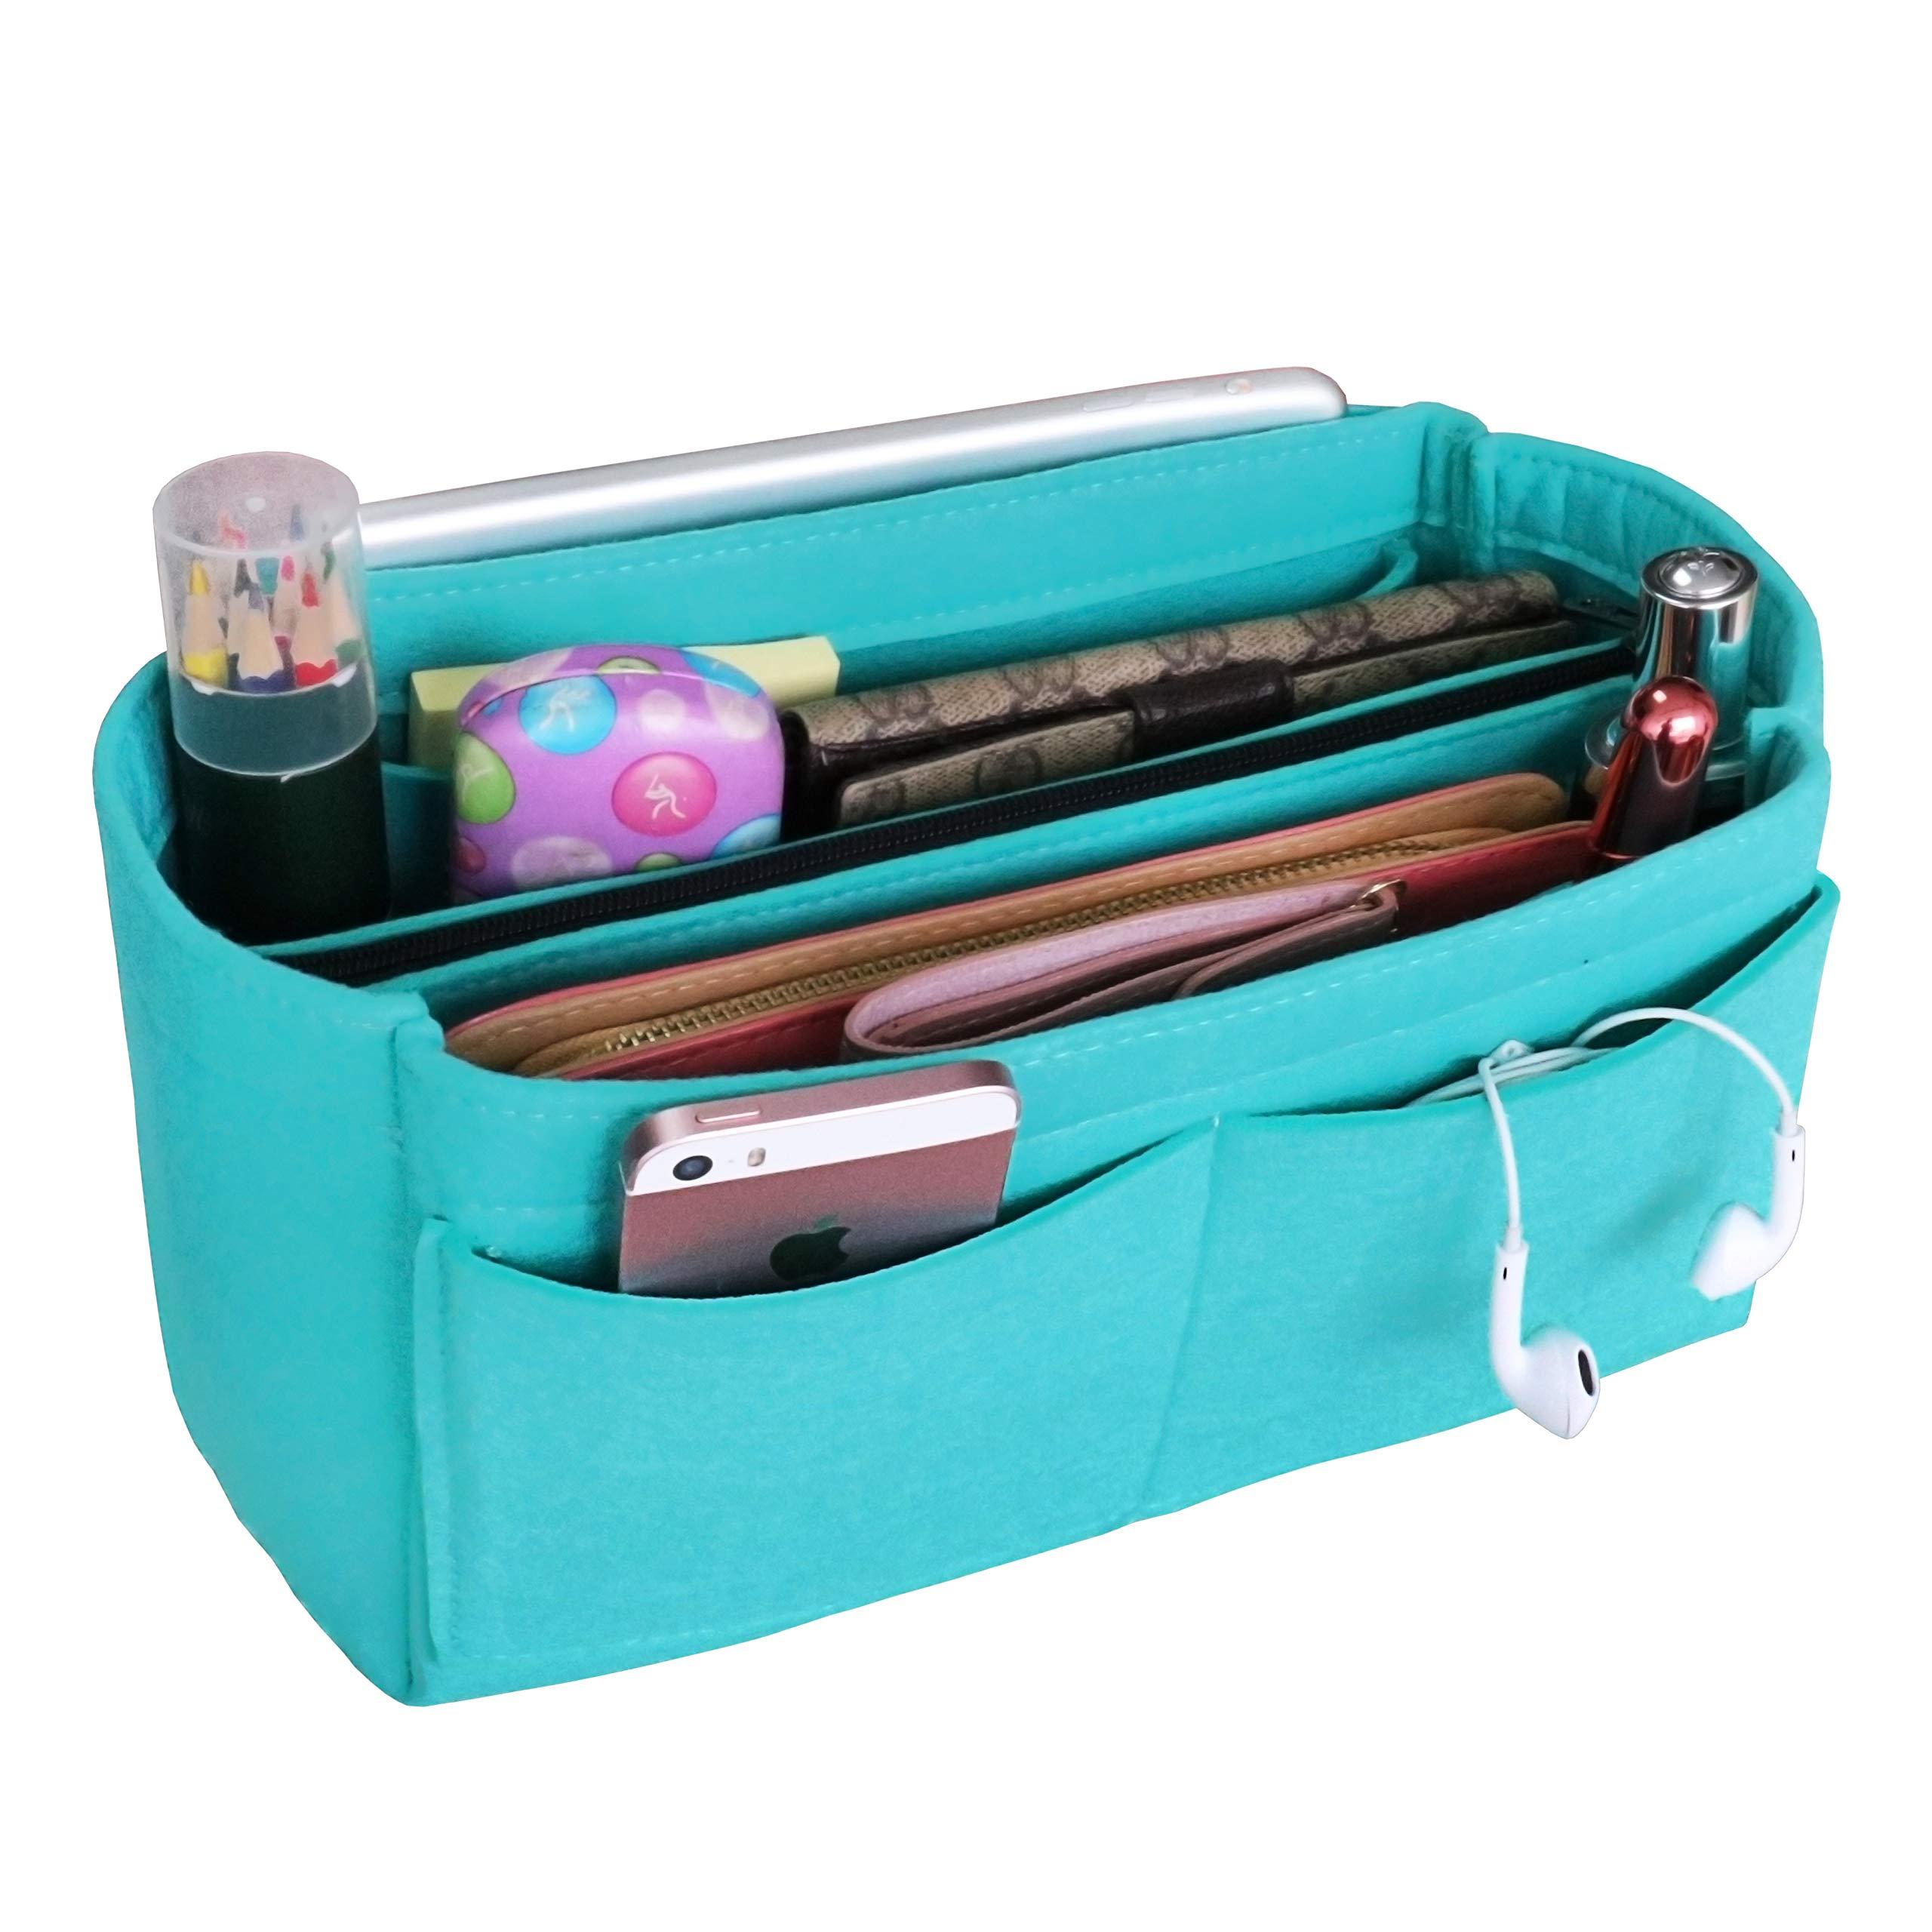 b0e944f24ebd ... 自立 大容量 収納バッグ 防水 軽量 高耐久性 撥水 出勤 旅行 レディース メンズ バックインバック bag in bag(15ポケット)  · apsoonsell Bag Organizer Inner ...